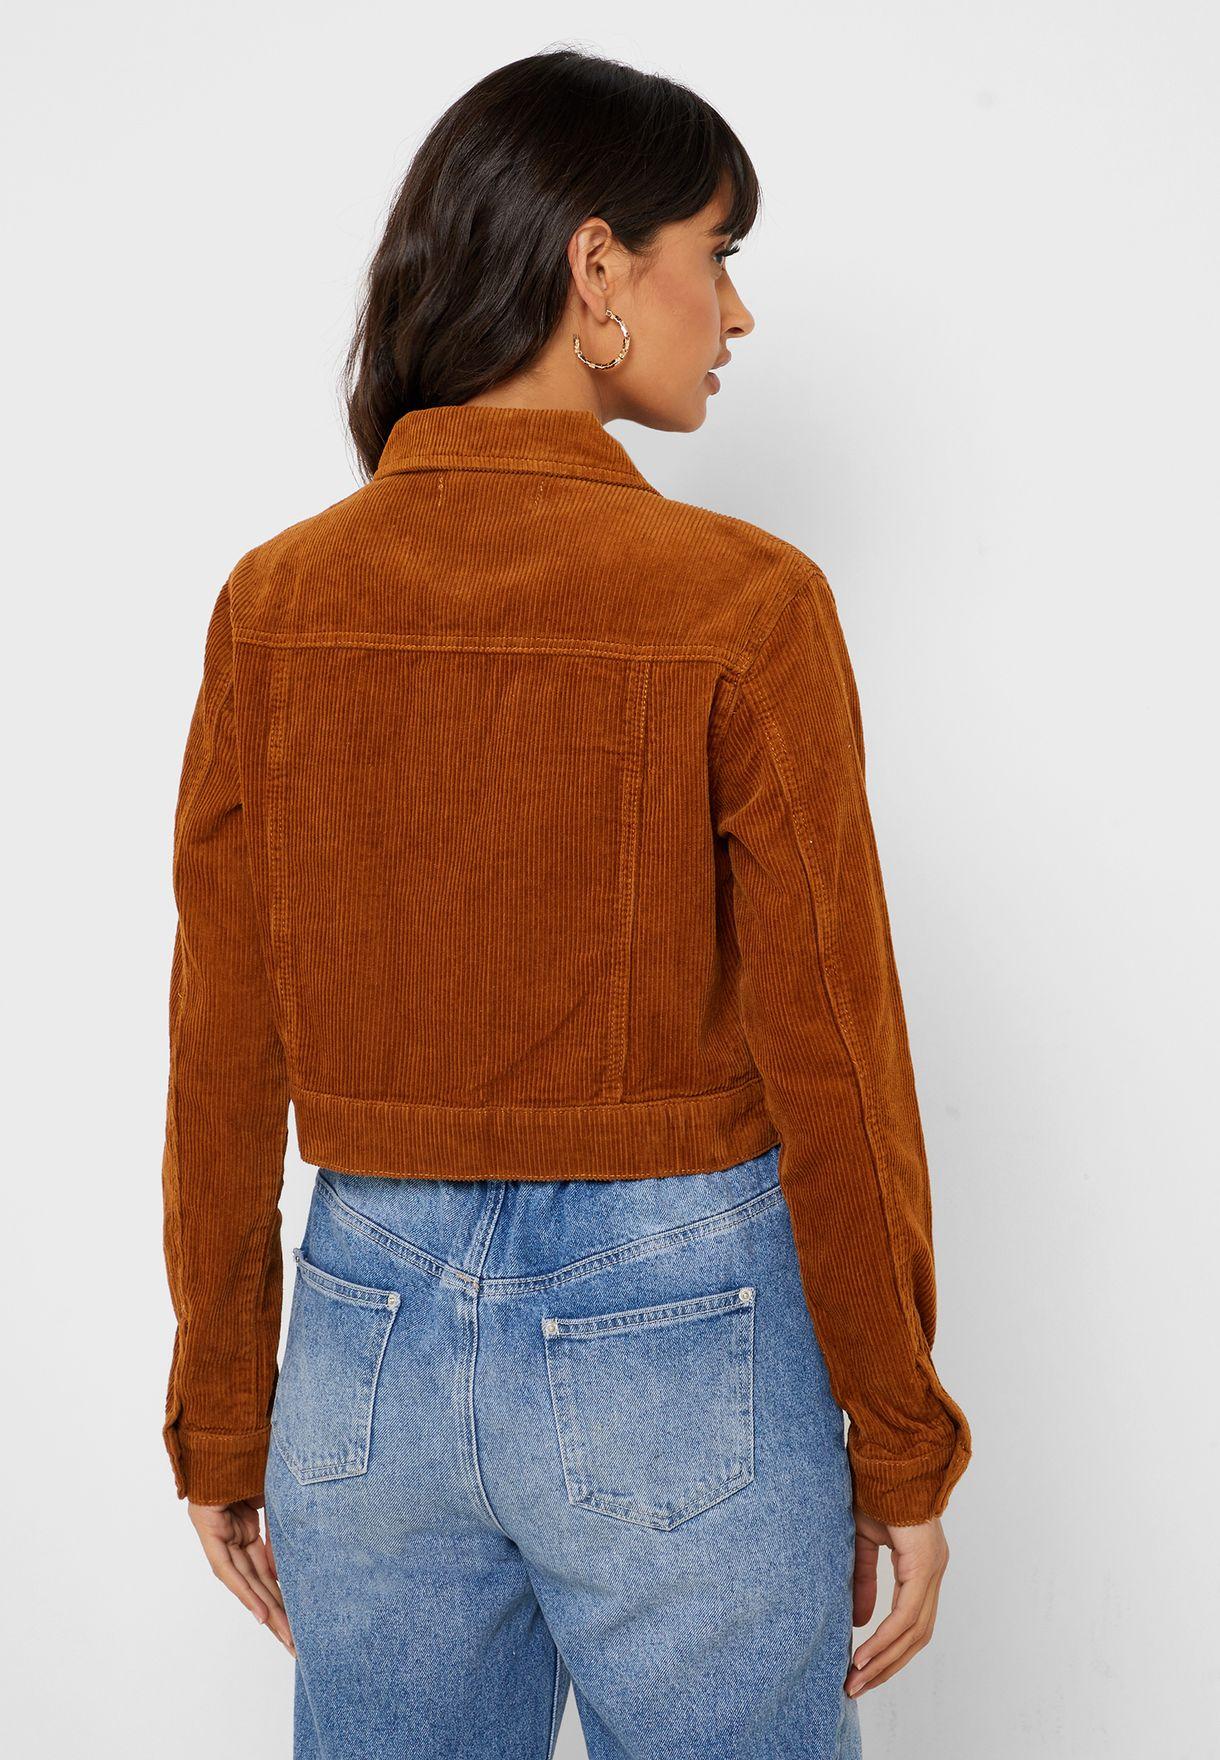 Pocket Detail Crop Jacket